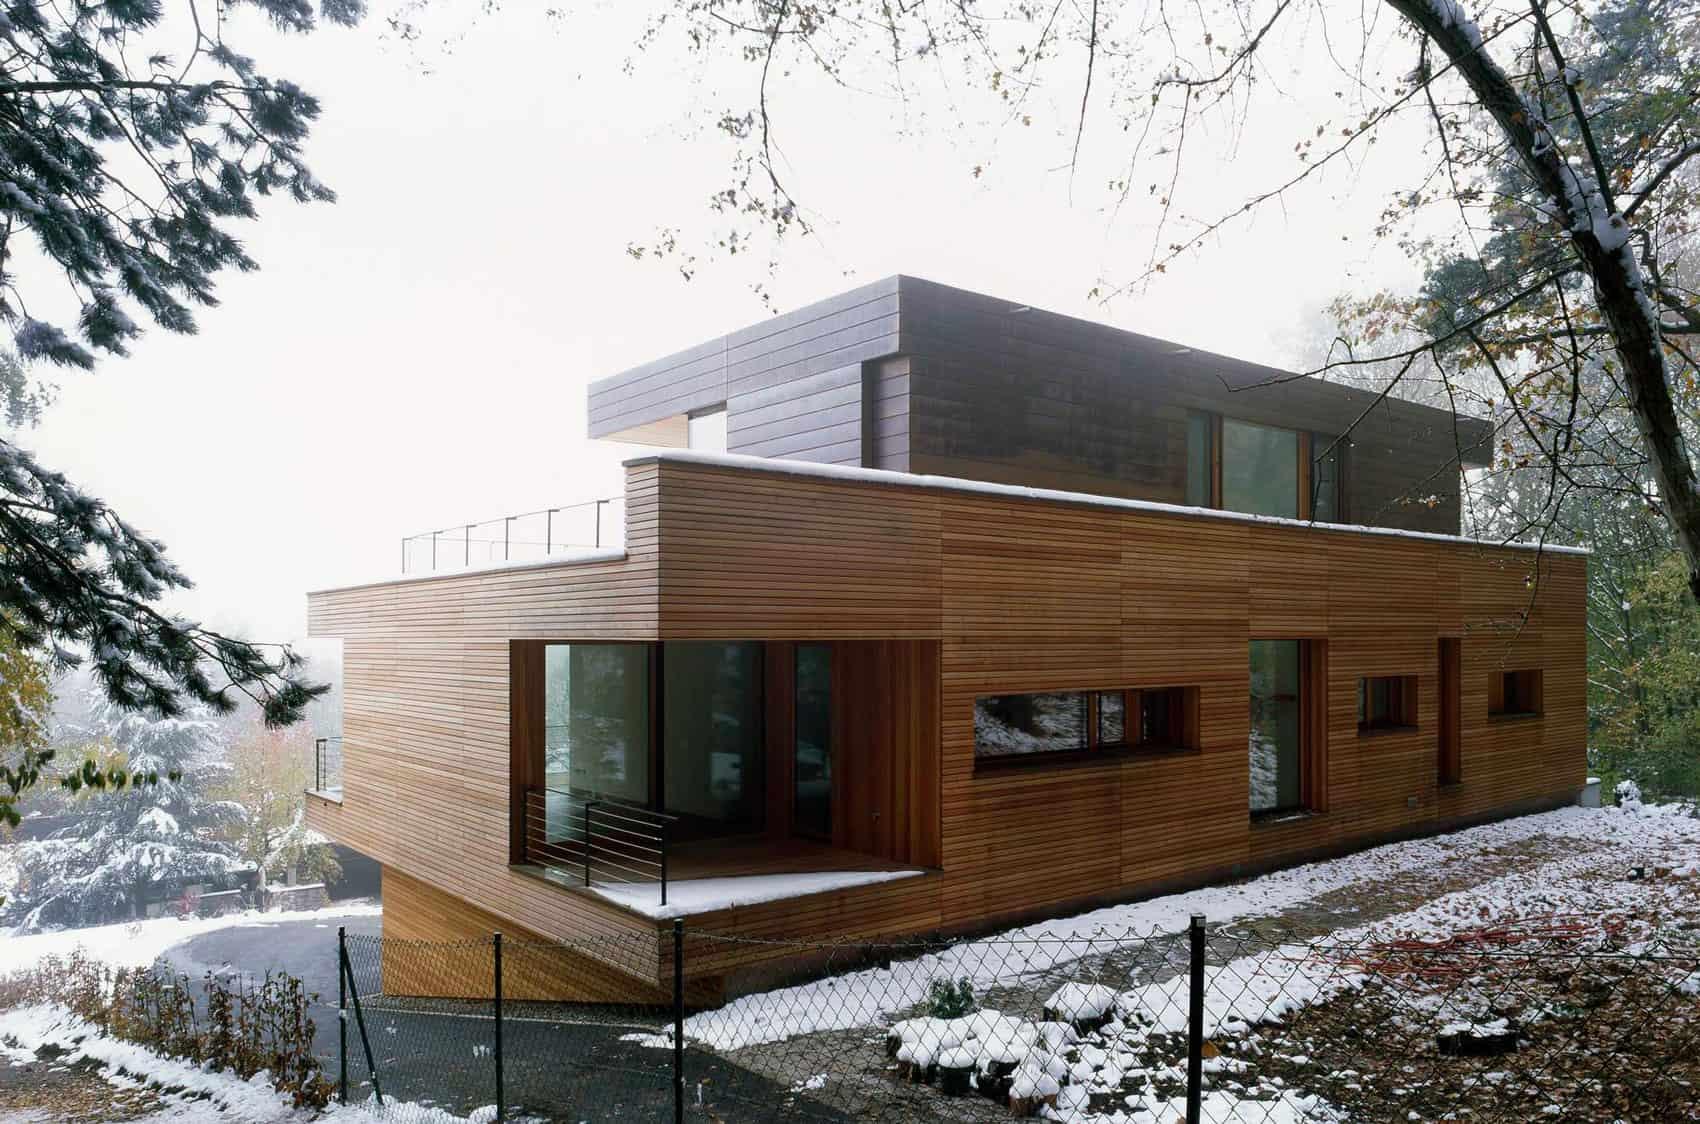 House Heilbronn by k m architektur (3)